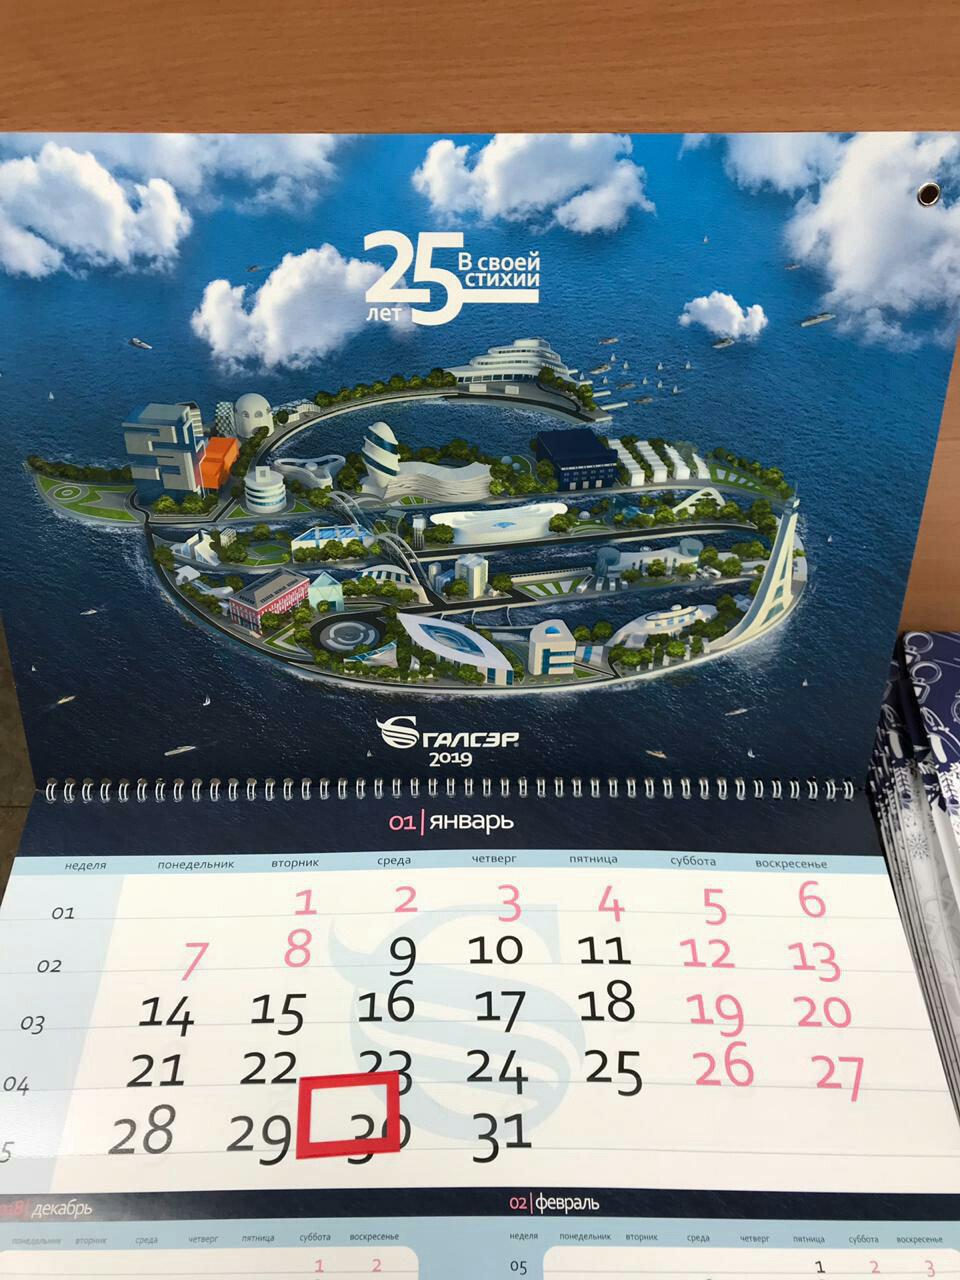 Рендер Иллюстрации Острова >4Гб intended for Lumba Kuda Calendar 2020